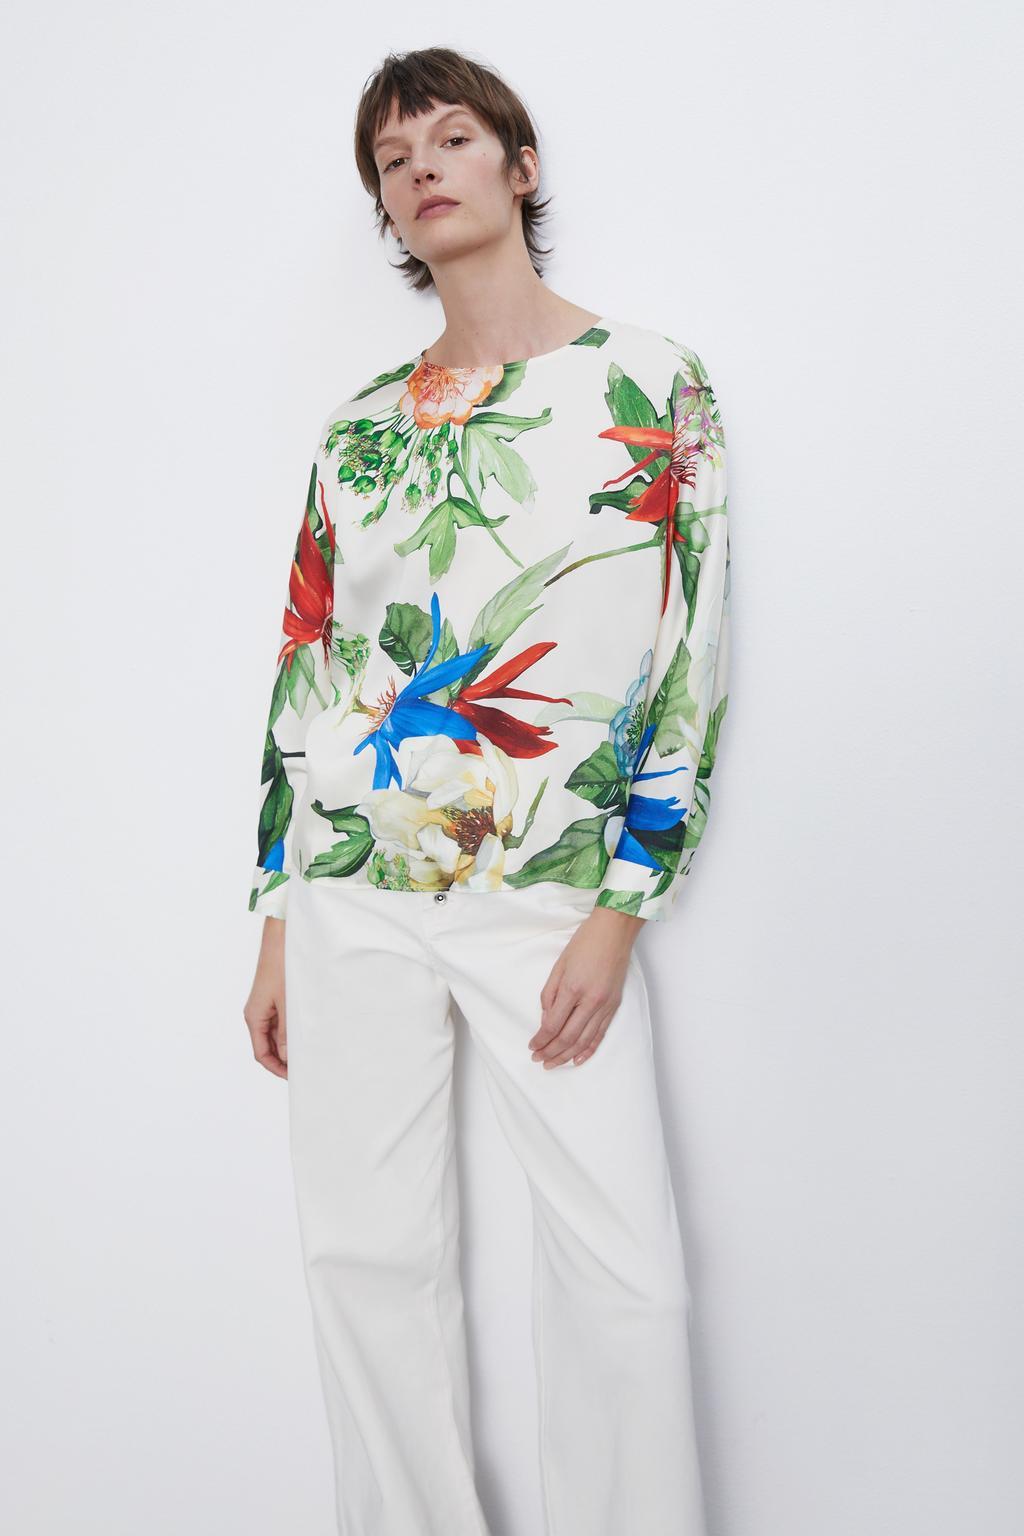 2020 New Spring Summer New Style European Printed Flowing Female Tops Zaraing Vadiming Sheining Women Printed Base Shirt